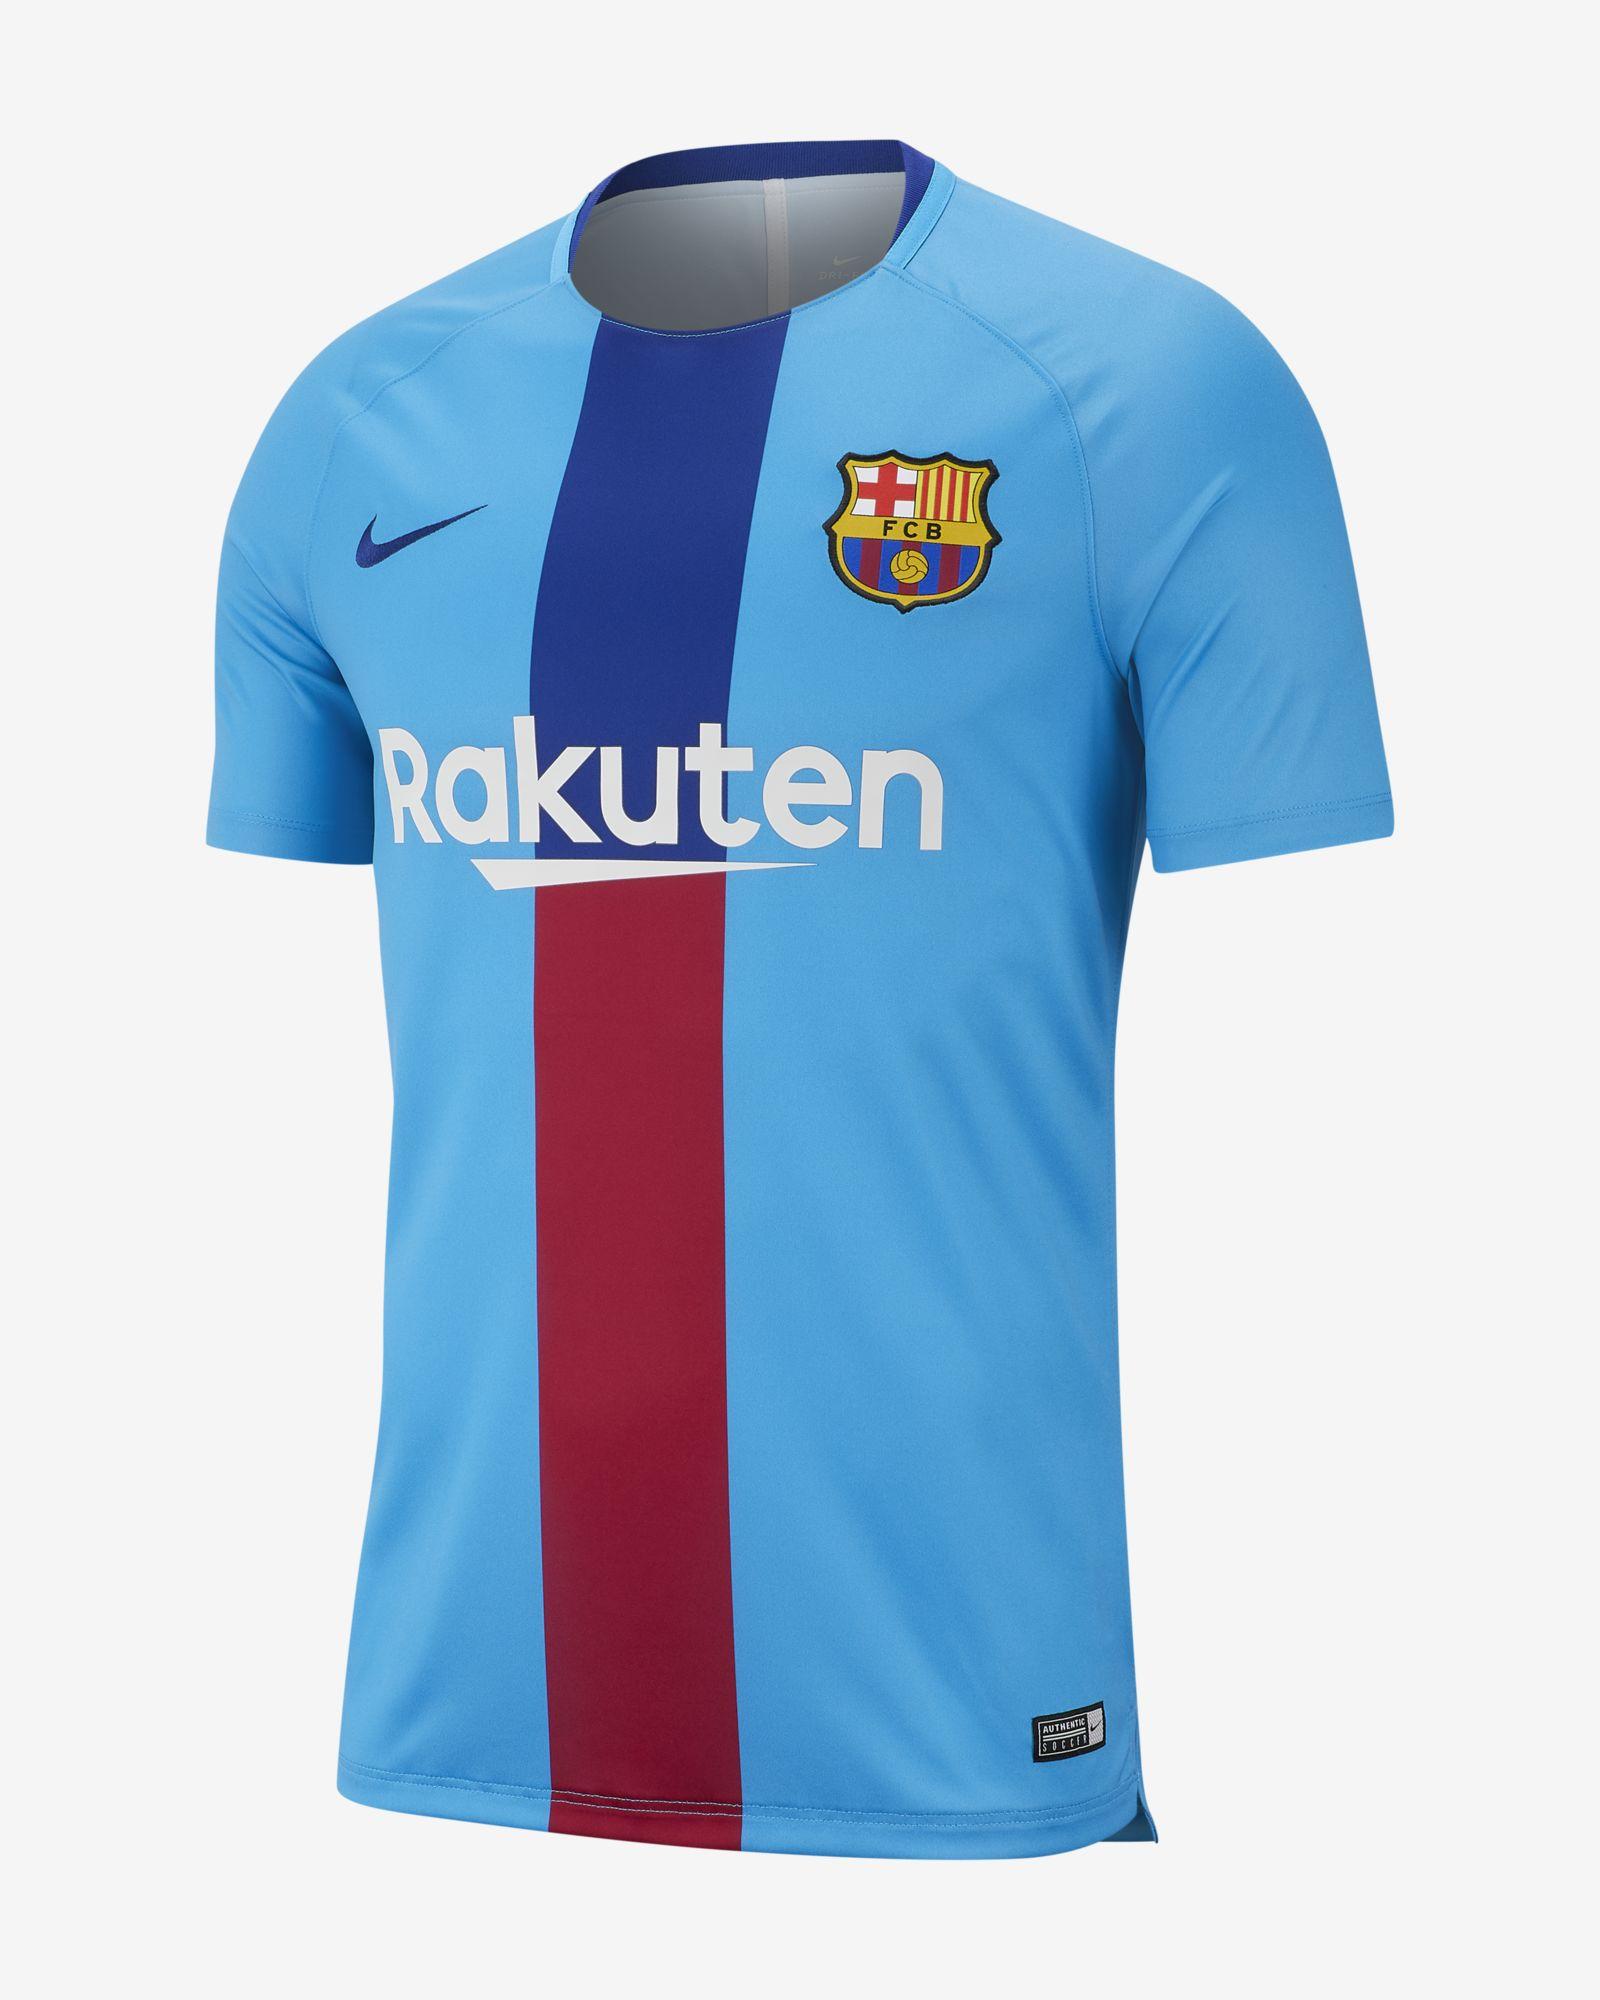 5b864fef0 Nike FC Barcelona 2018 19 Squad Tee - Soccer Shop Barcelona FC Merchandise  - Superfanas.lt